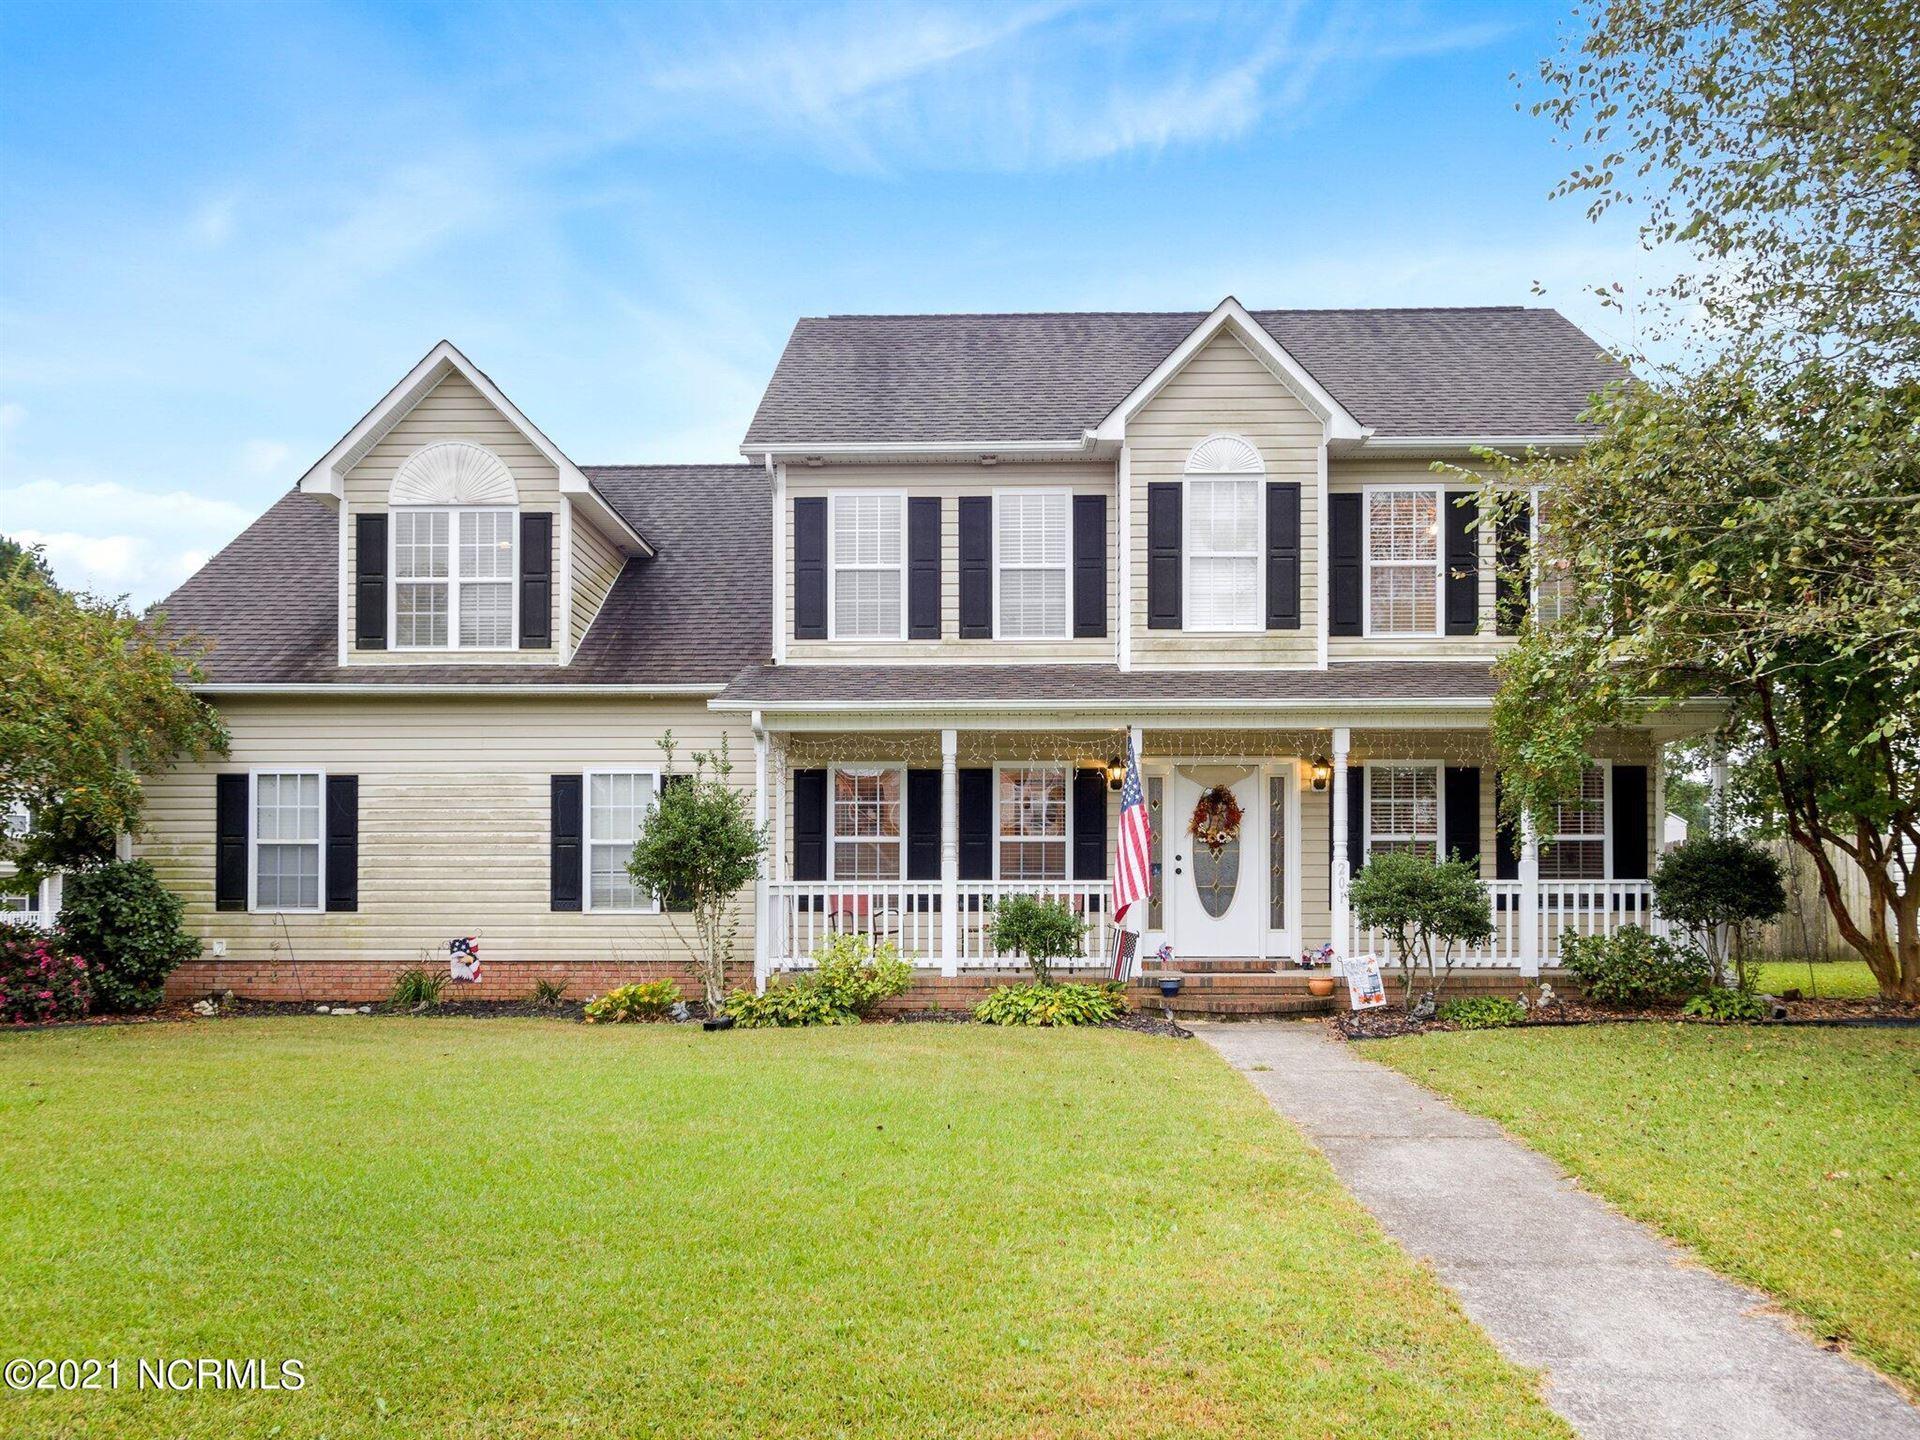 Photo of 101 Murville Court, Jacksonville, NC 28546 (MLS # 100293305)